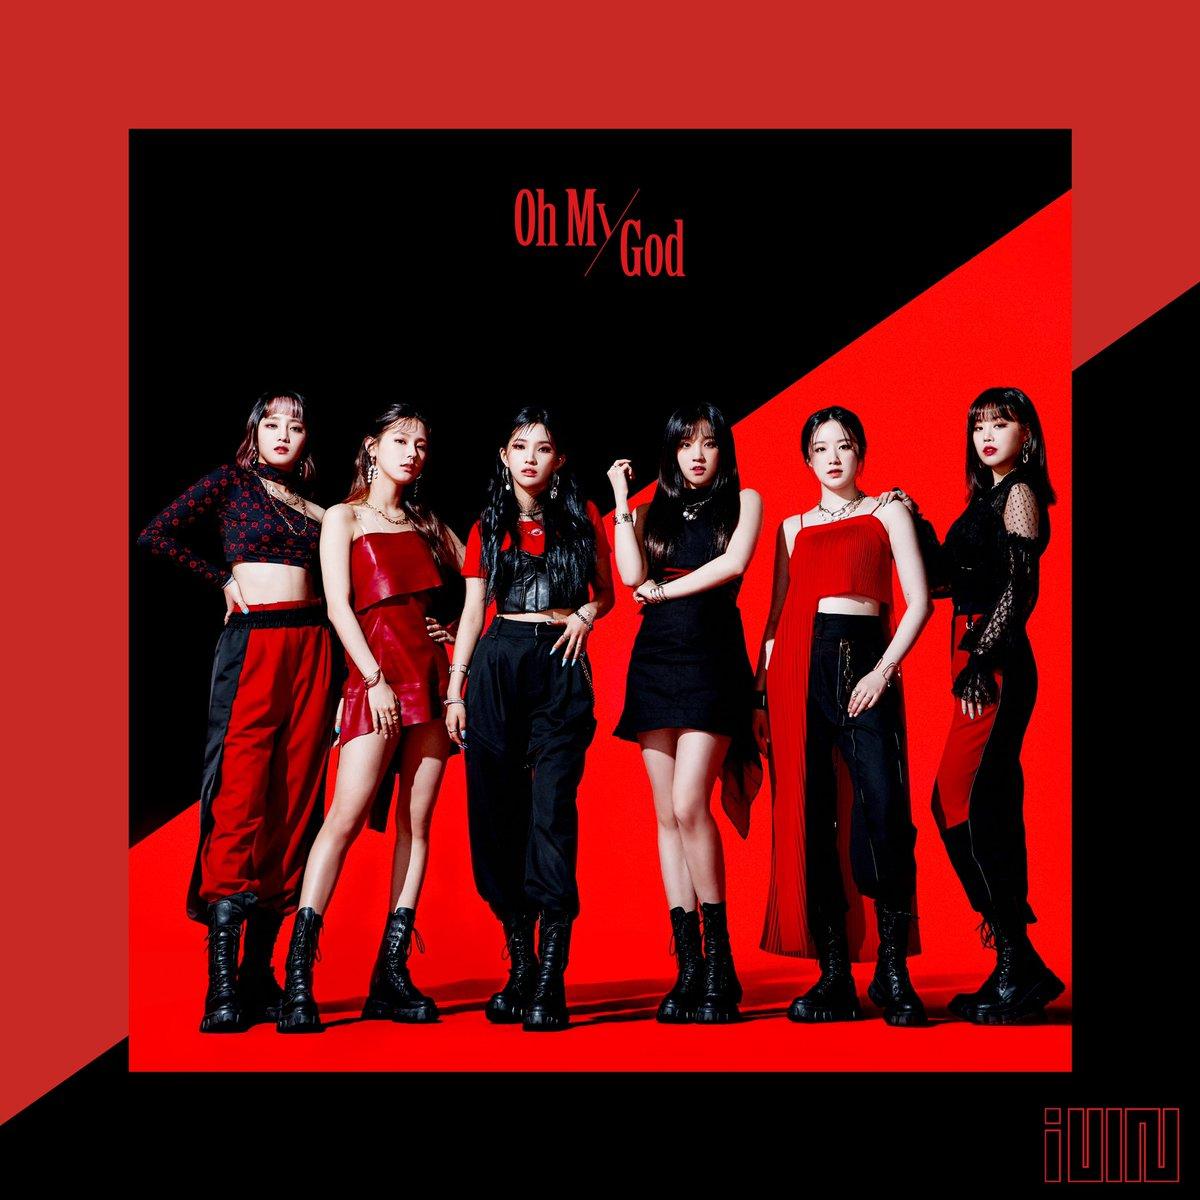 JAPAN 2nd Mini Album「Oh my god」2020.8.26 IN STORES❤️🖤❤️ジャケット写真&特設サイト開設!▶️#여자아이들 #GIDLE #アイドゥル#Ohmygod #Ohmygod0826